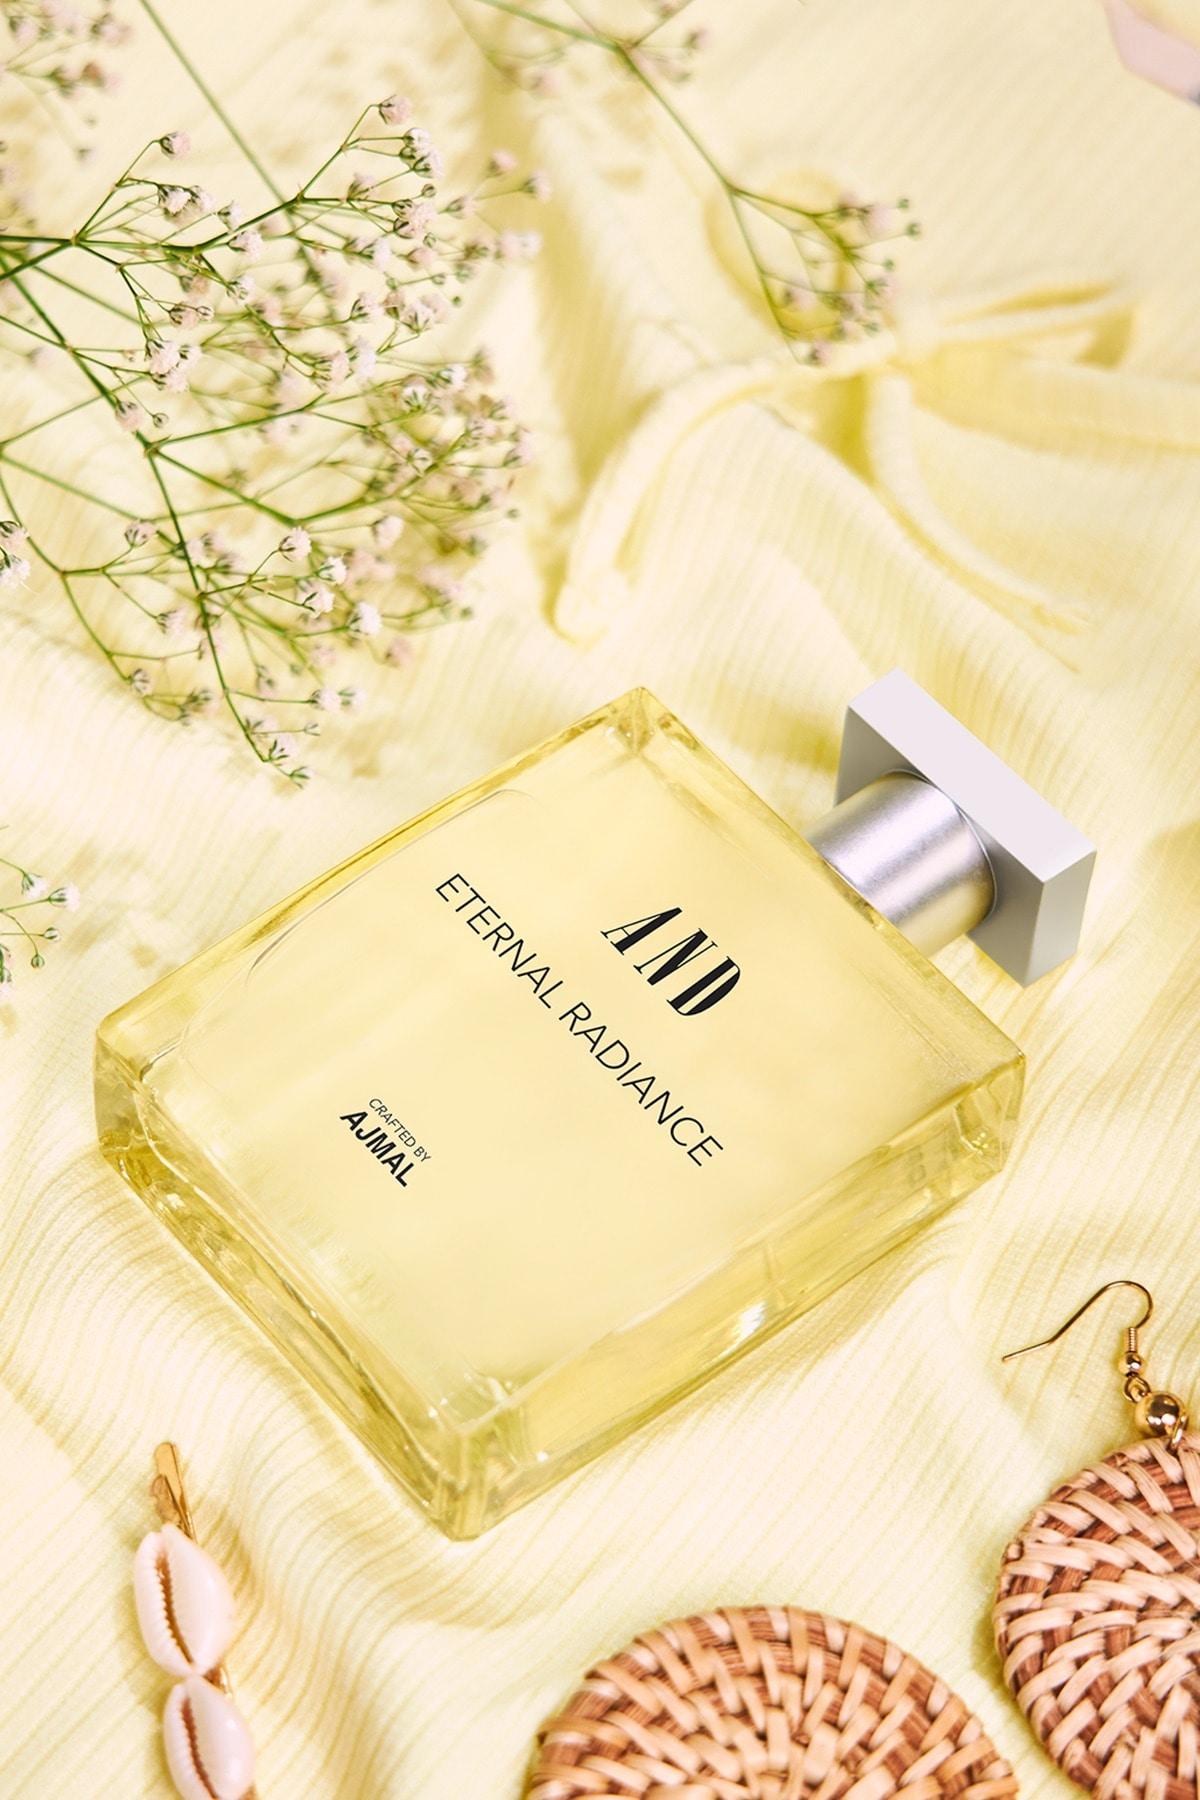 AND   Eternal Radiance Woody Rose Eau De Parfum